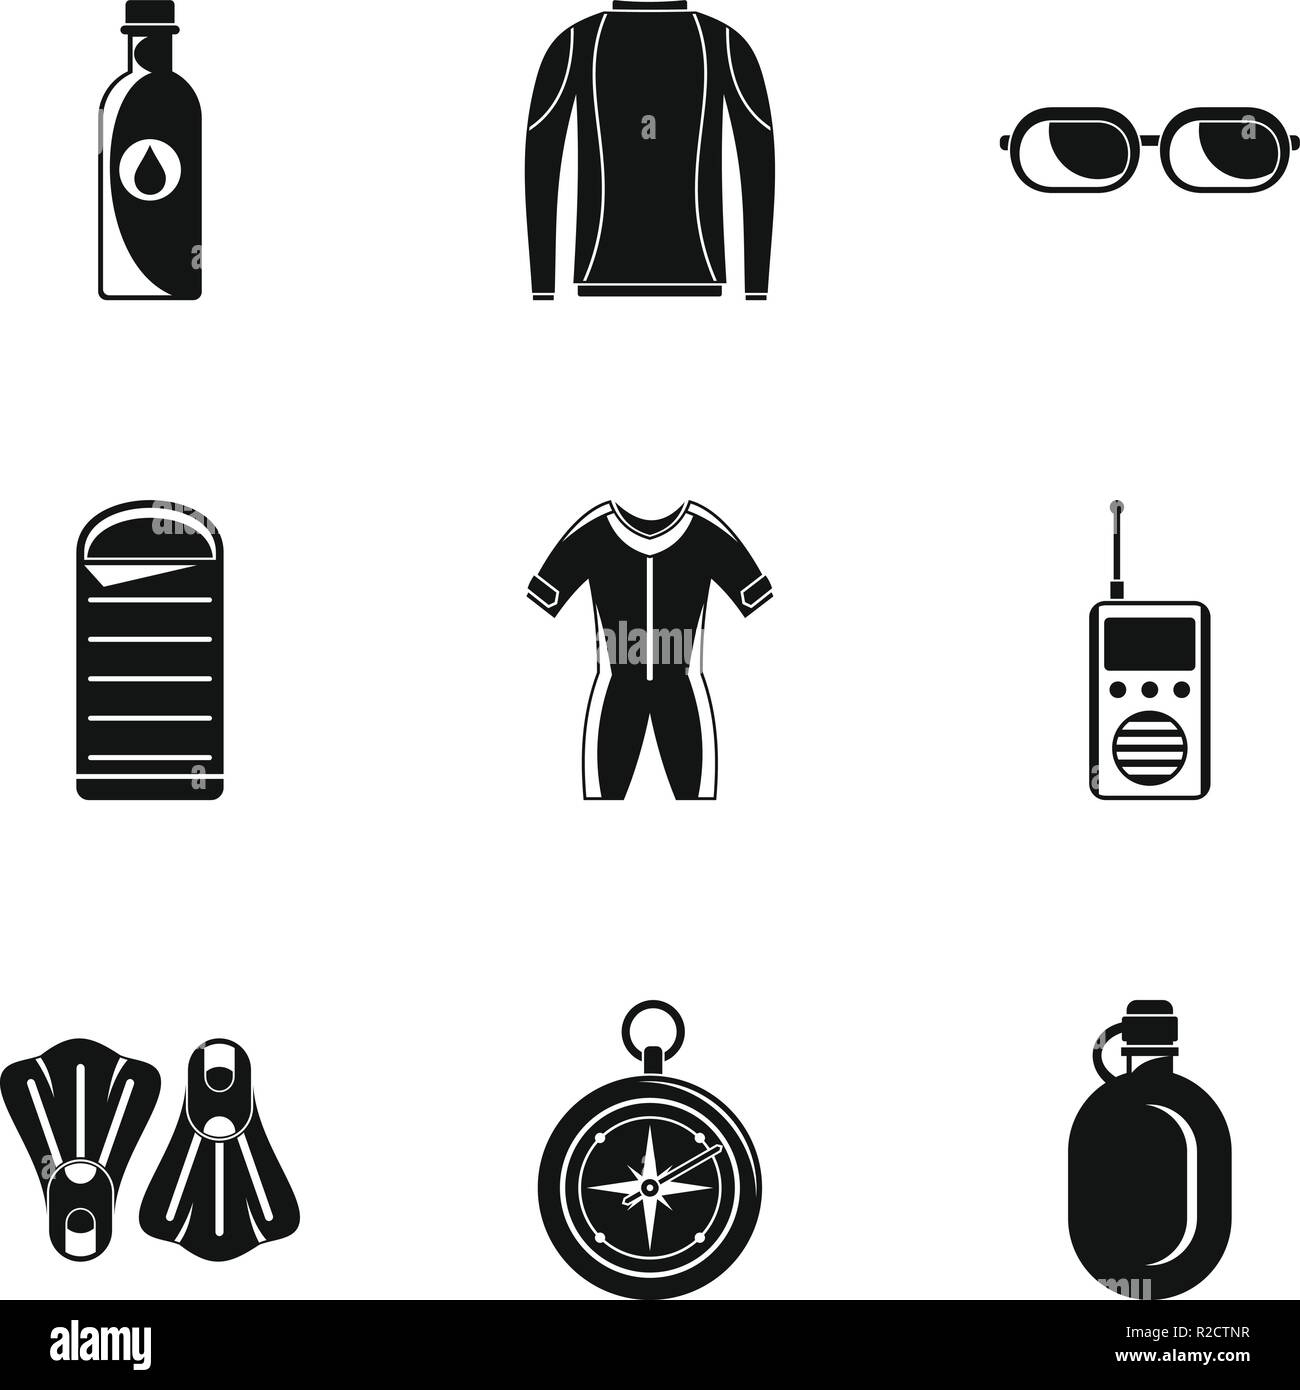 Icônes d'immersion. Simple jeu d'immersion 9 vector icons for web isolé sur fond blanc Photo Stock